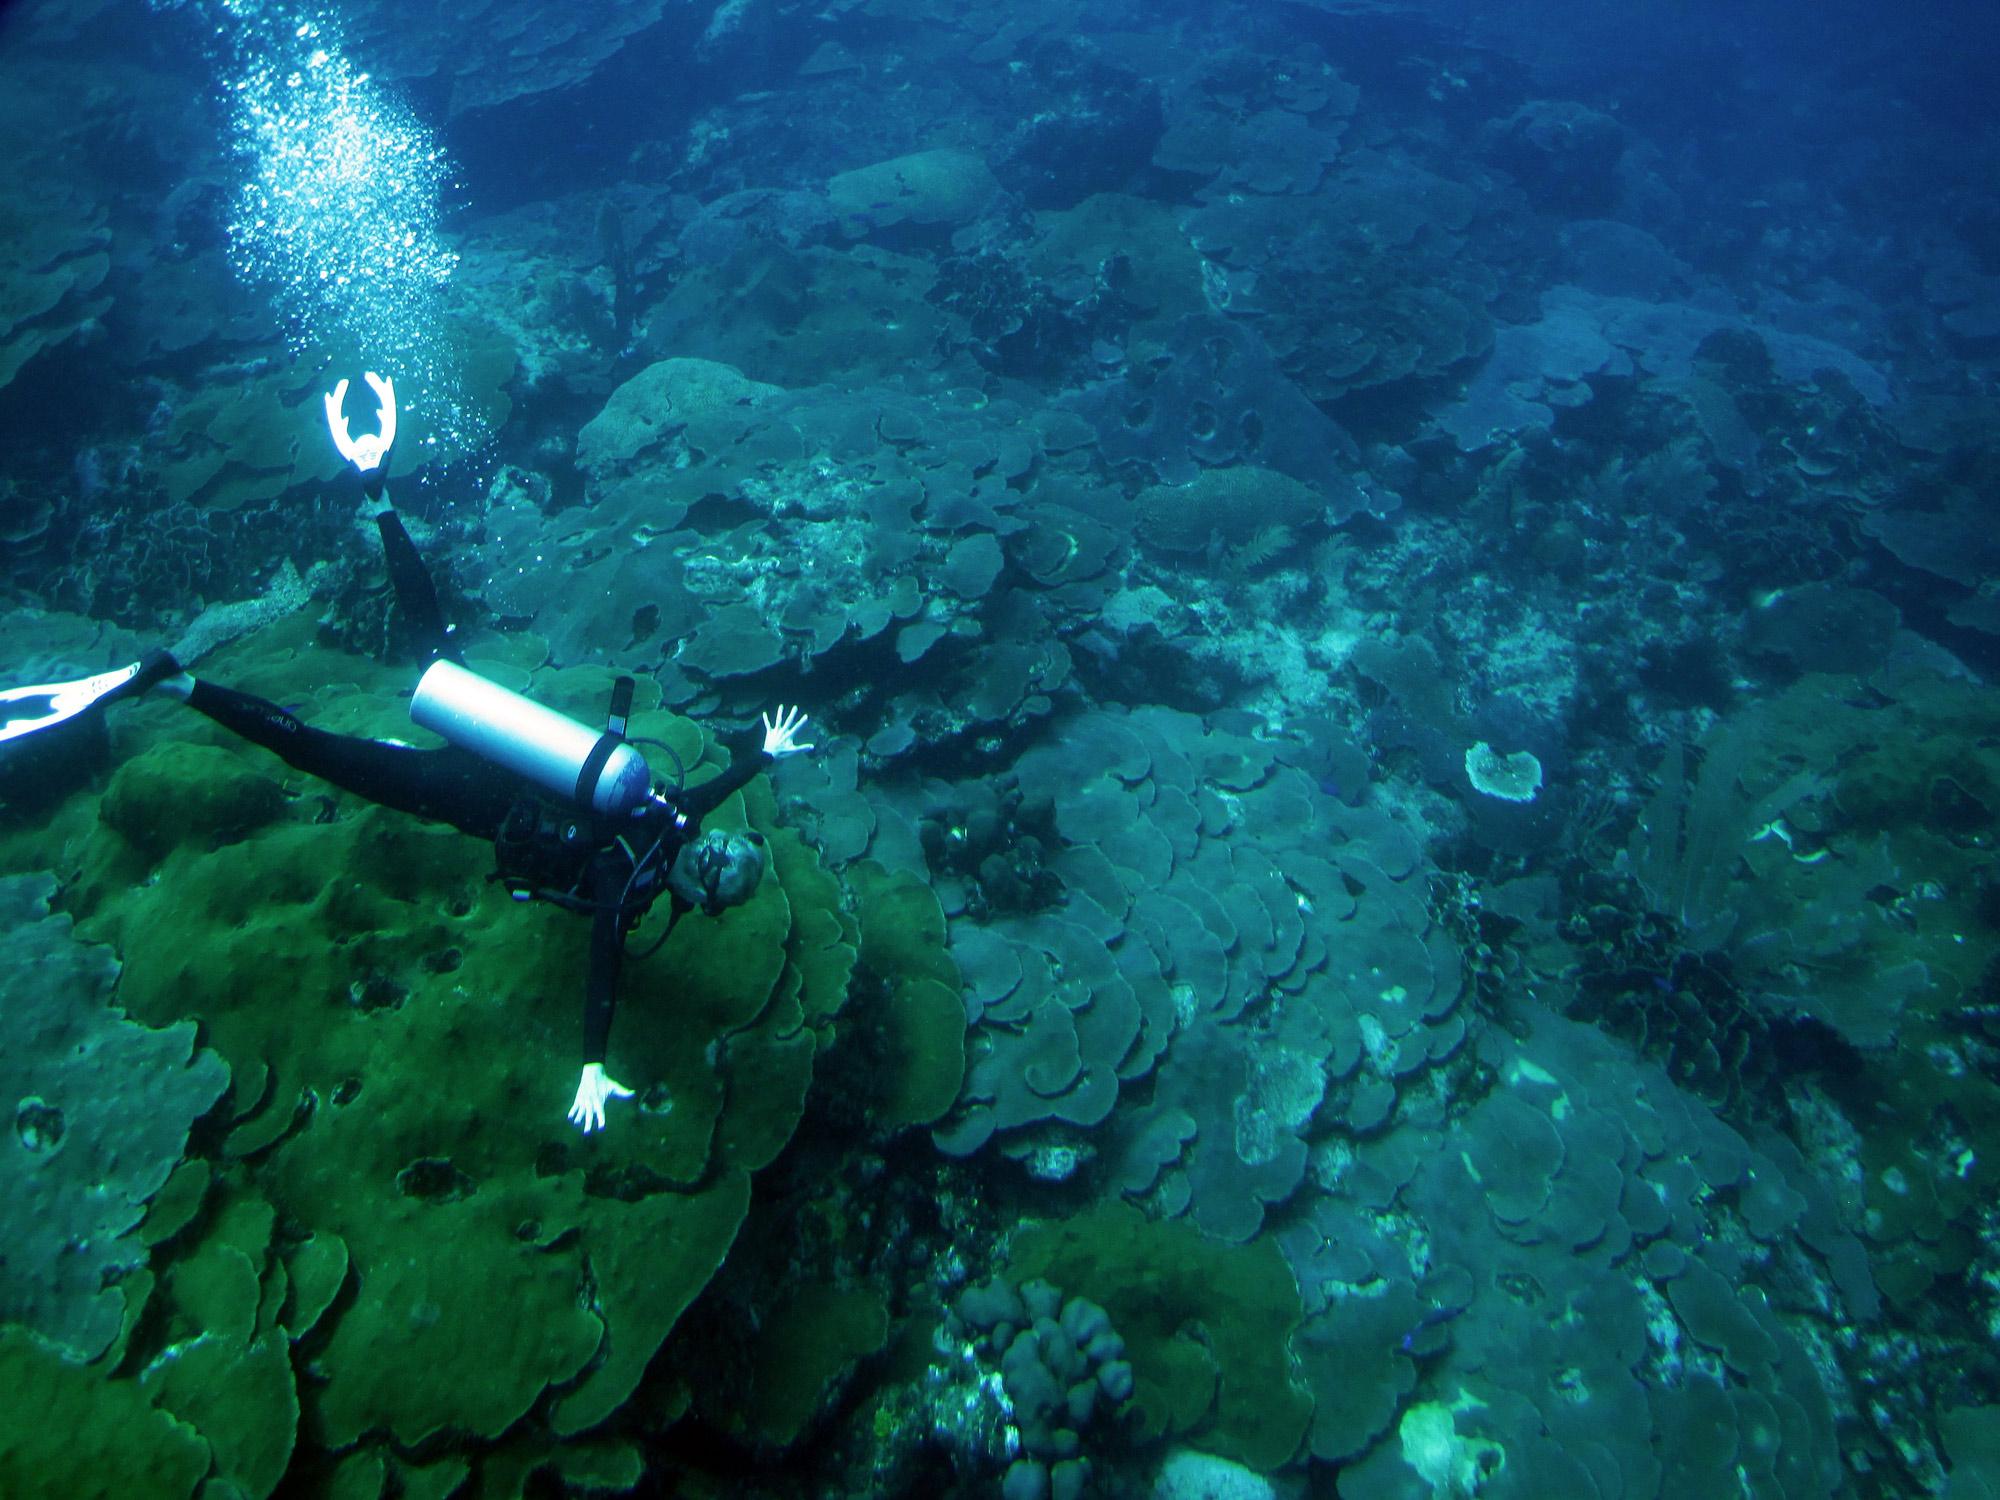 13-Kristen-Marhaver-diving-at-Boka-Patrik-credit-Mark-Vermeij